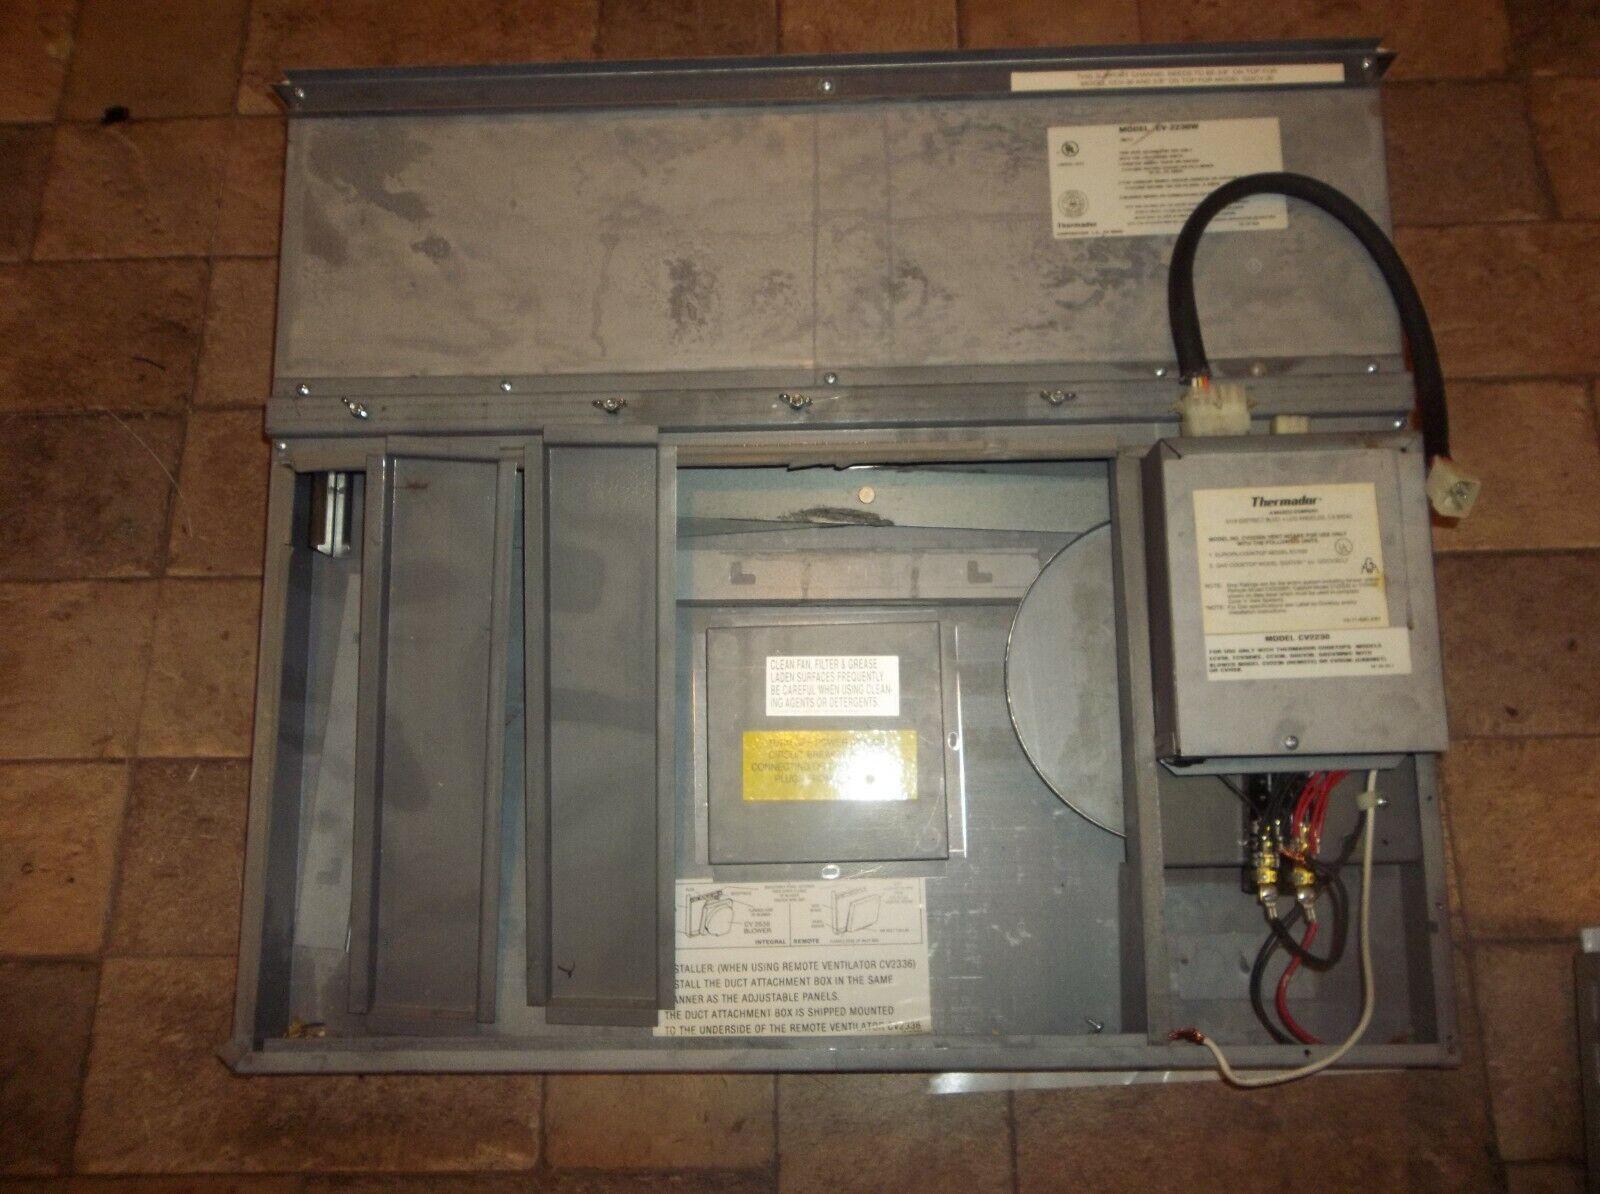 00143089 Vtn30rq Cook Vent Blower Motor 19 11 978 Thermador Rdds30vrs Major Appliances Home Garden